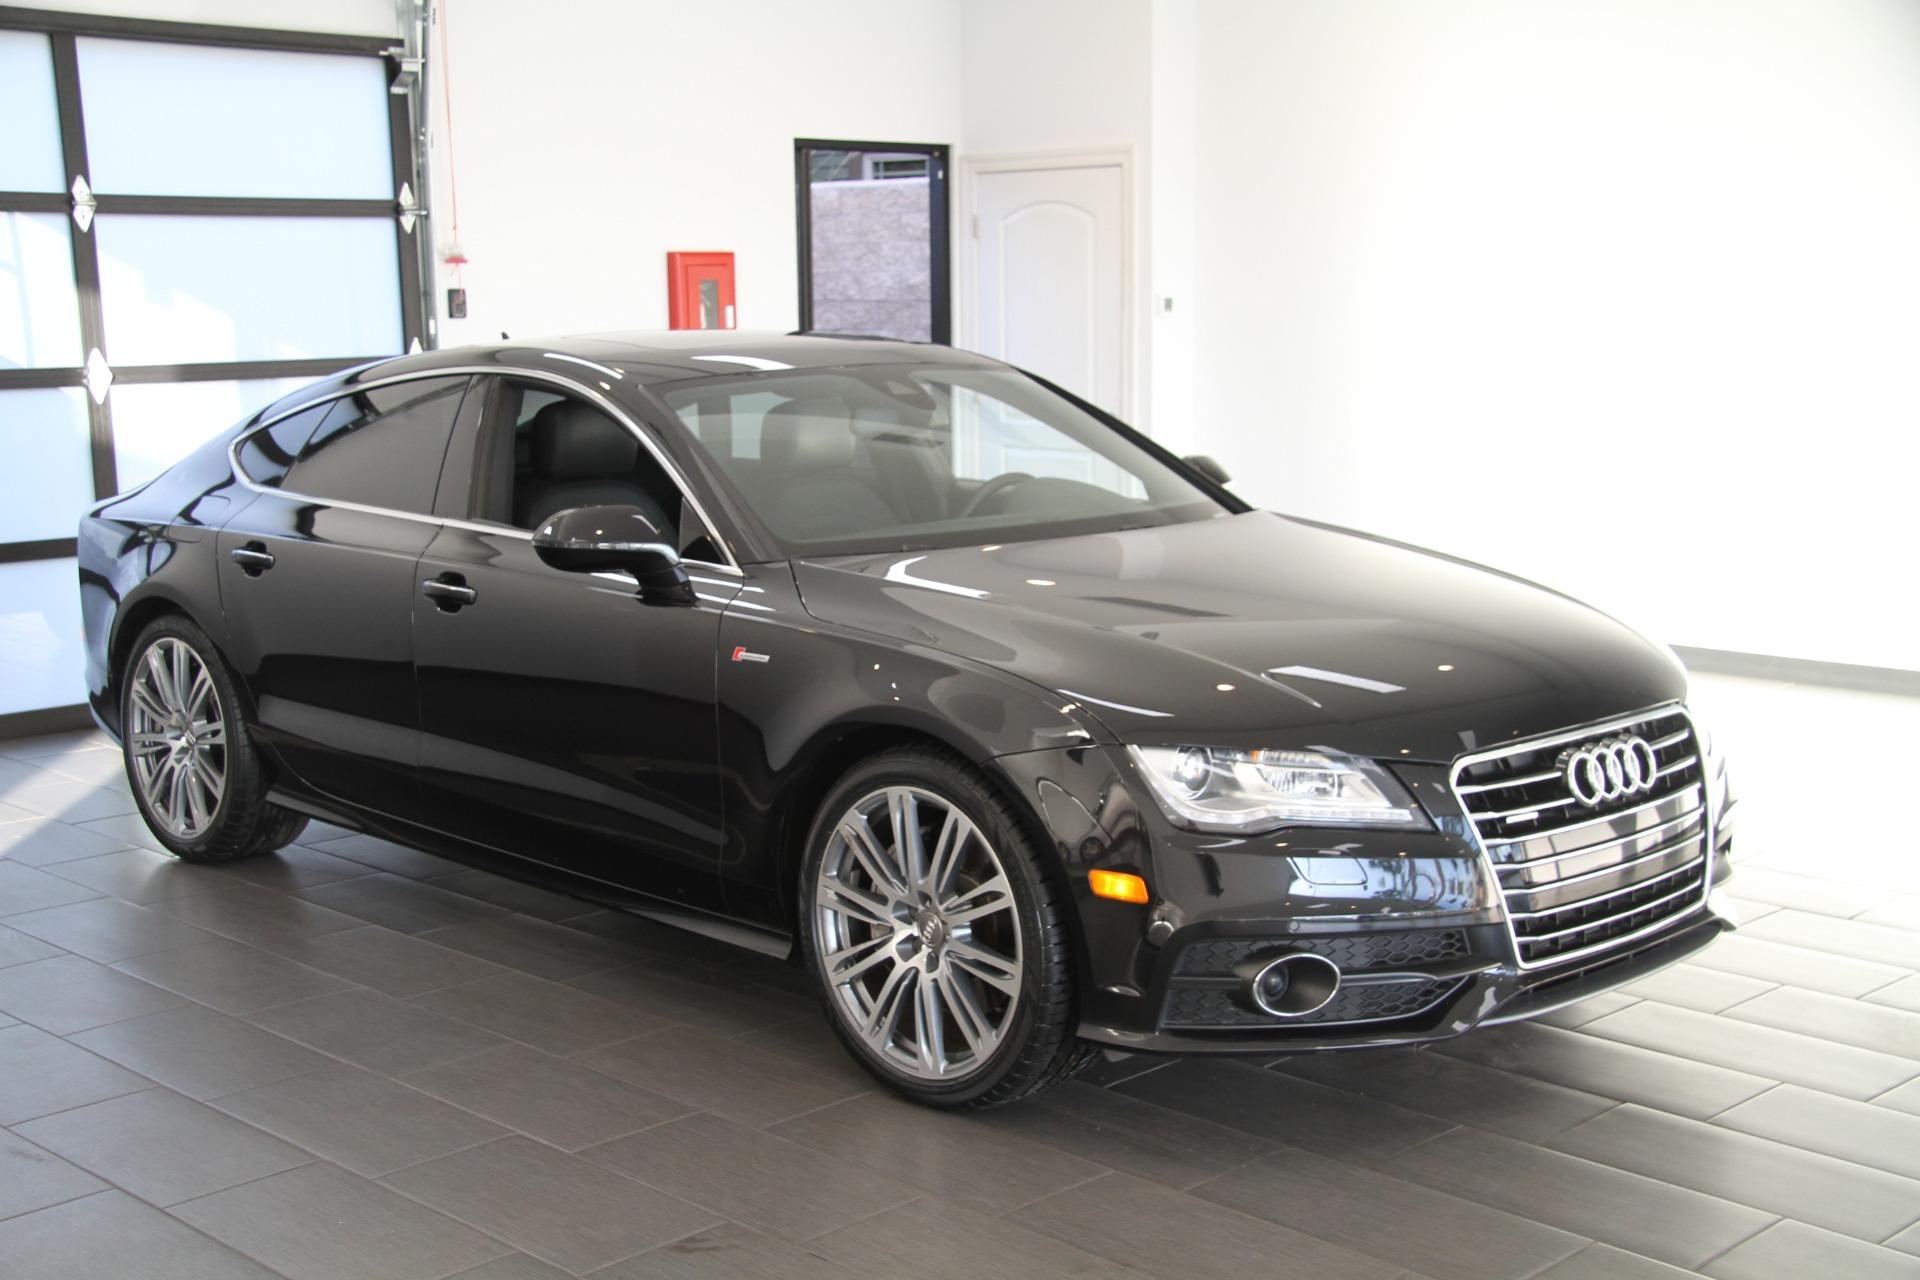 Audi Dealership Near Me >> 2013 Audi A7 3.0T quattro Prestige S-Line Stock # 6106 for ...